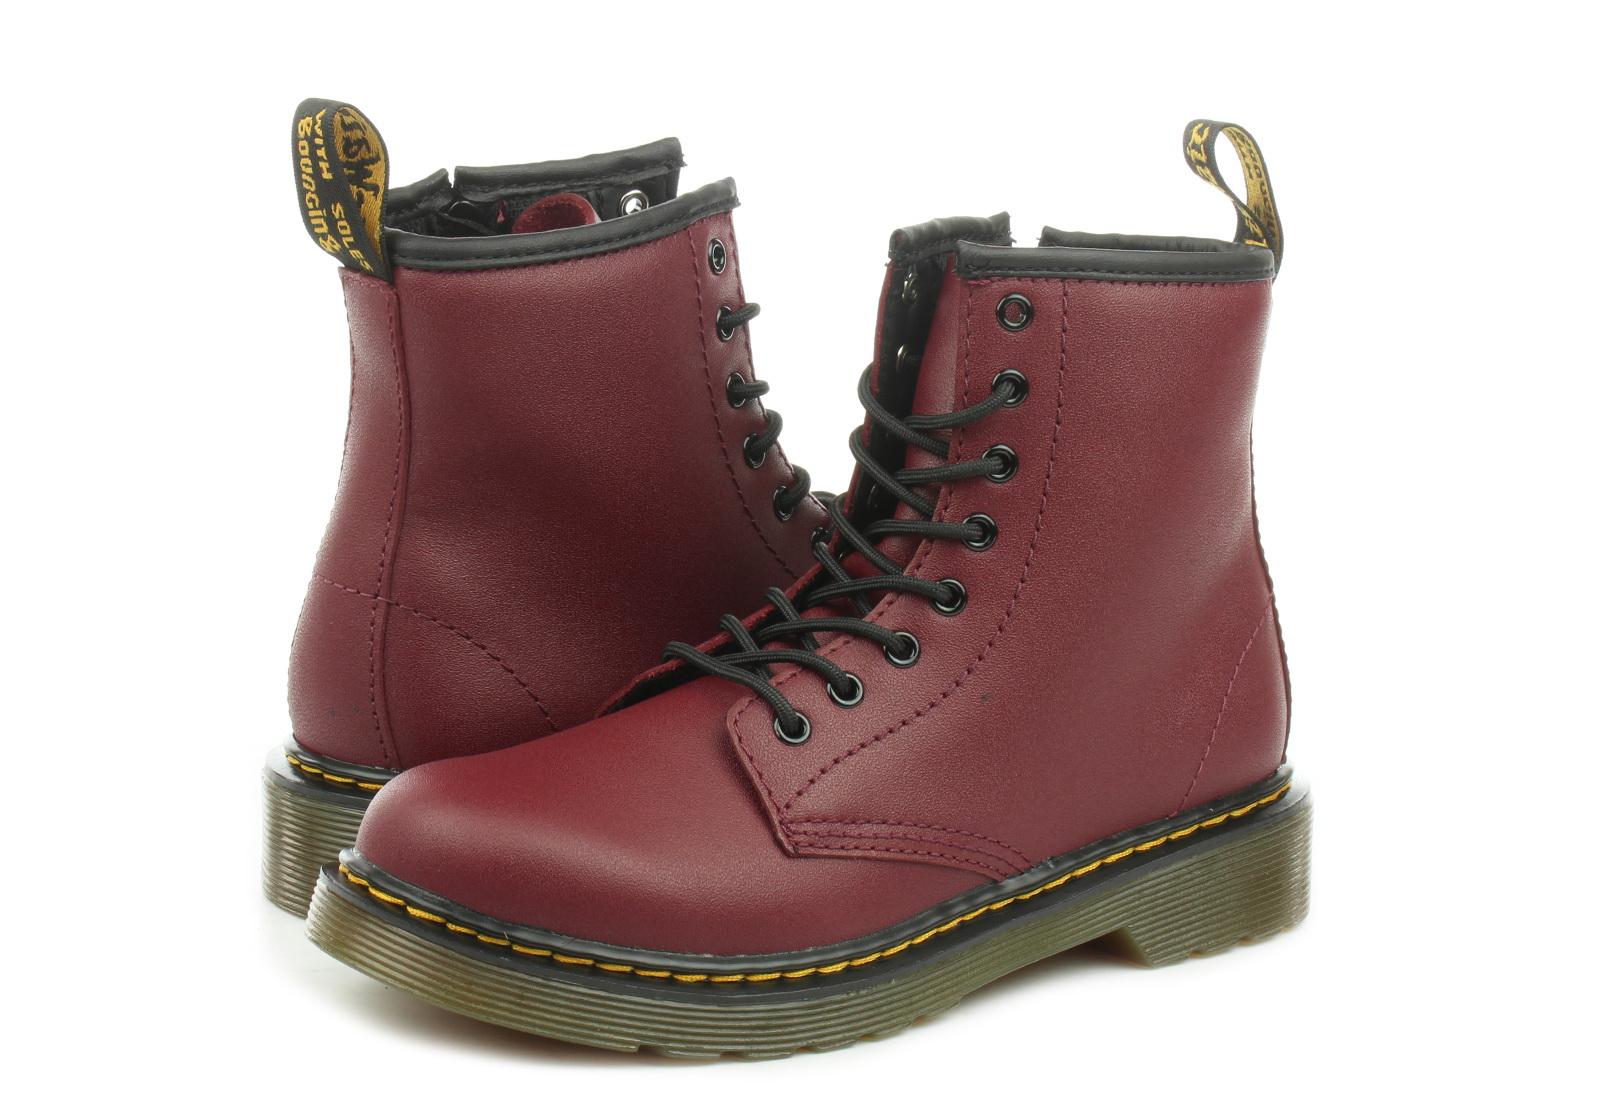 Dr Martens Duboke cipele 1460 Y